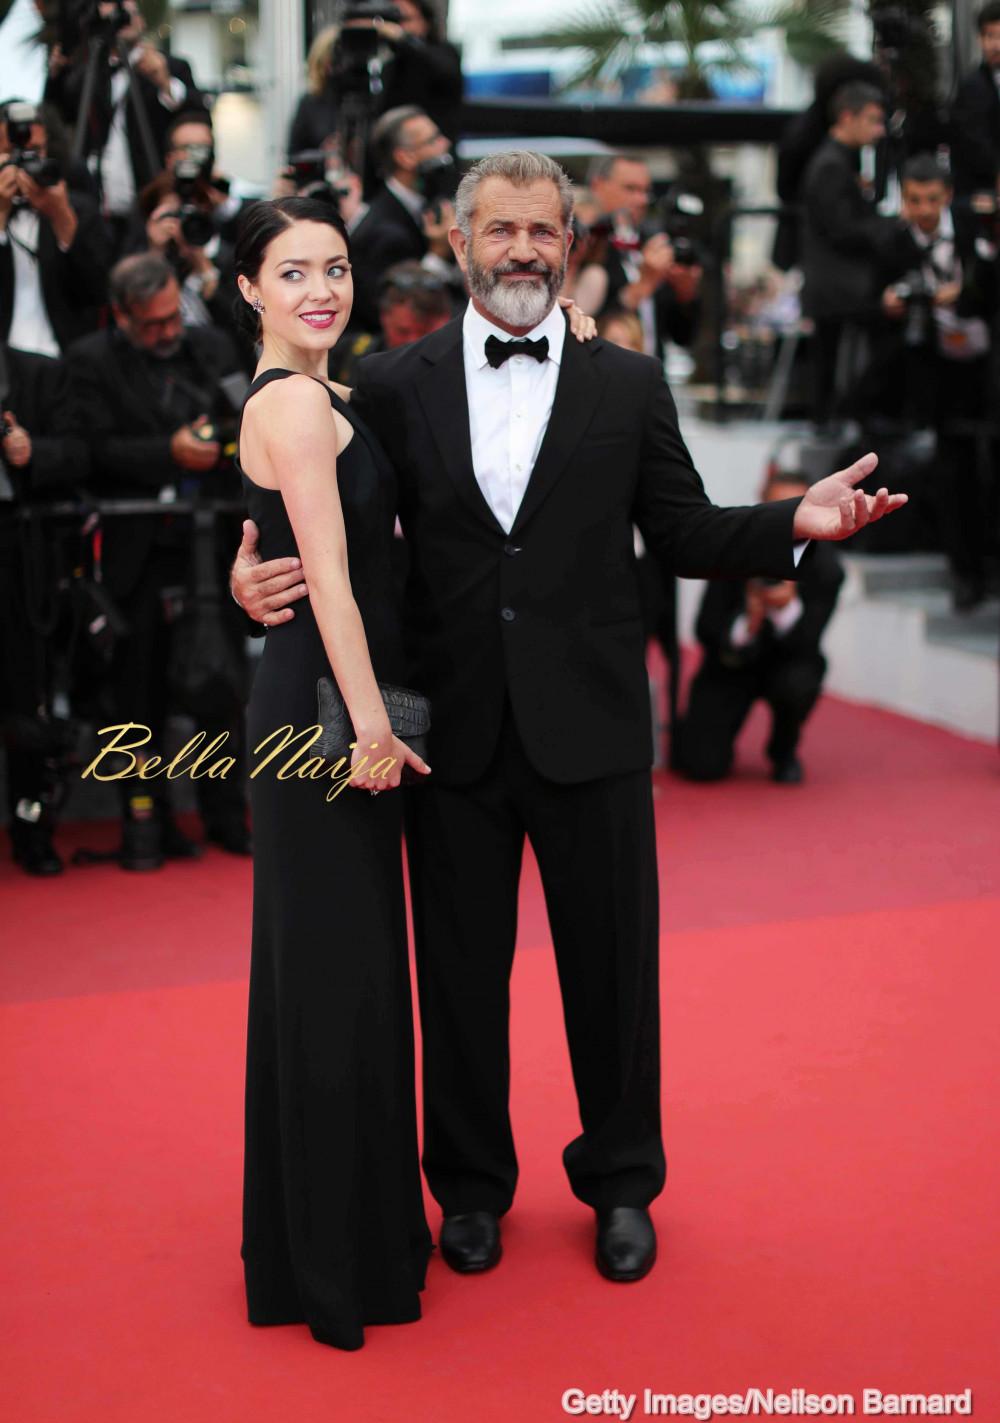 Red Carpet Photos: Mel Gibson, Kirsten Dunst & More Stars ... Оксана Григорьева